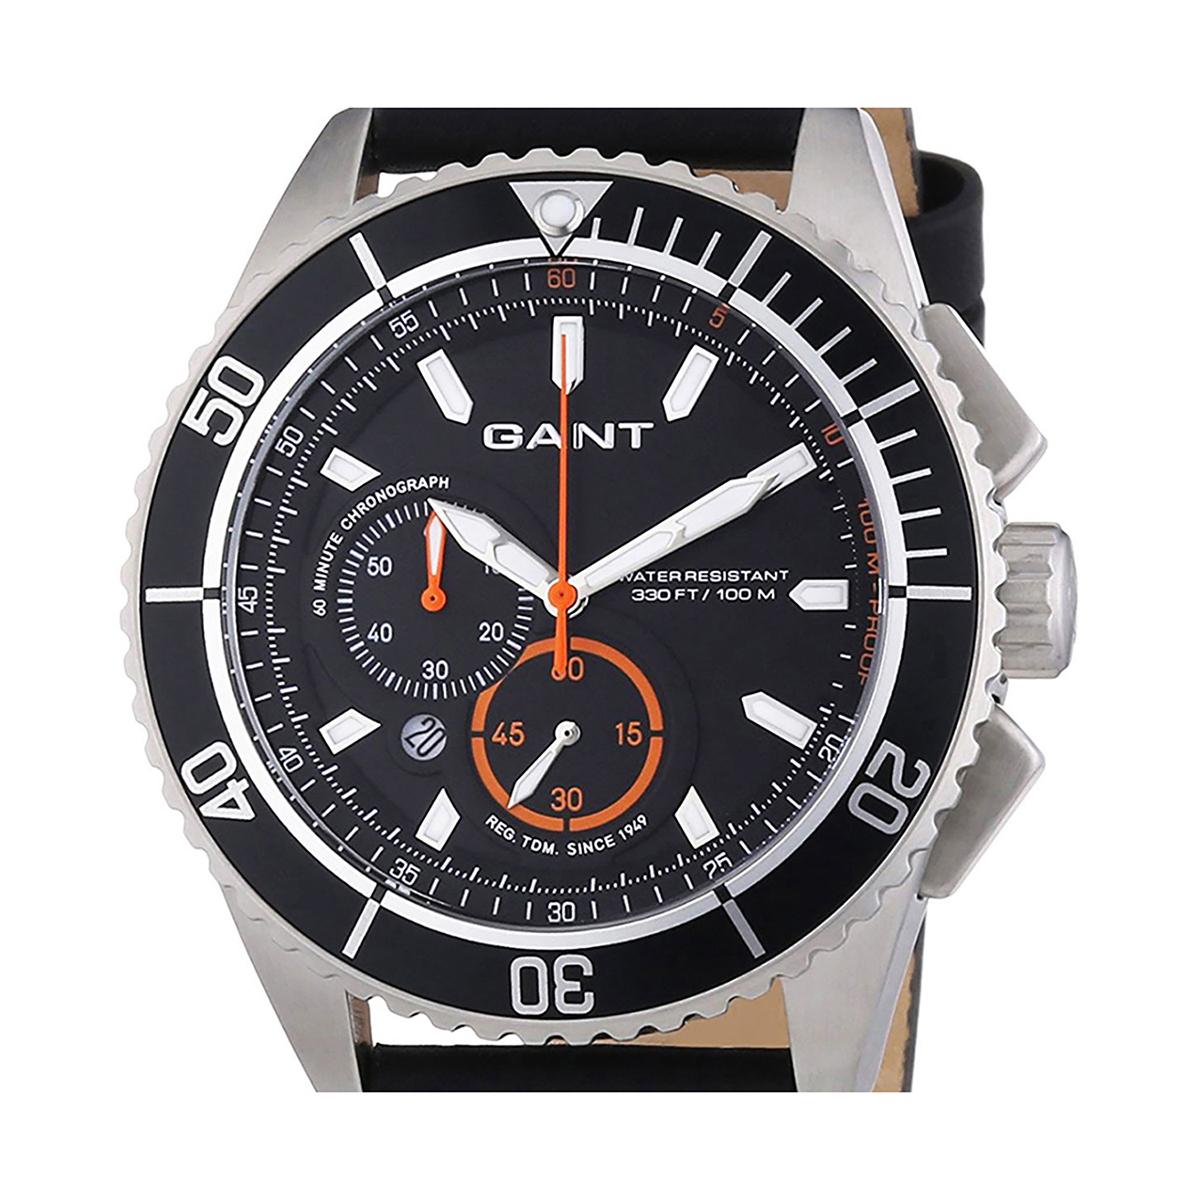 GANT ガント 電池式クォーツ 腕時計 [W70544] 並行輸入品 ブラック(黒)